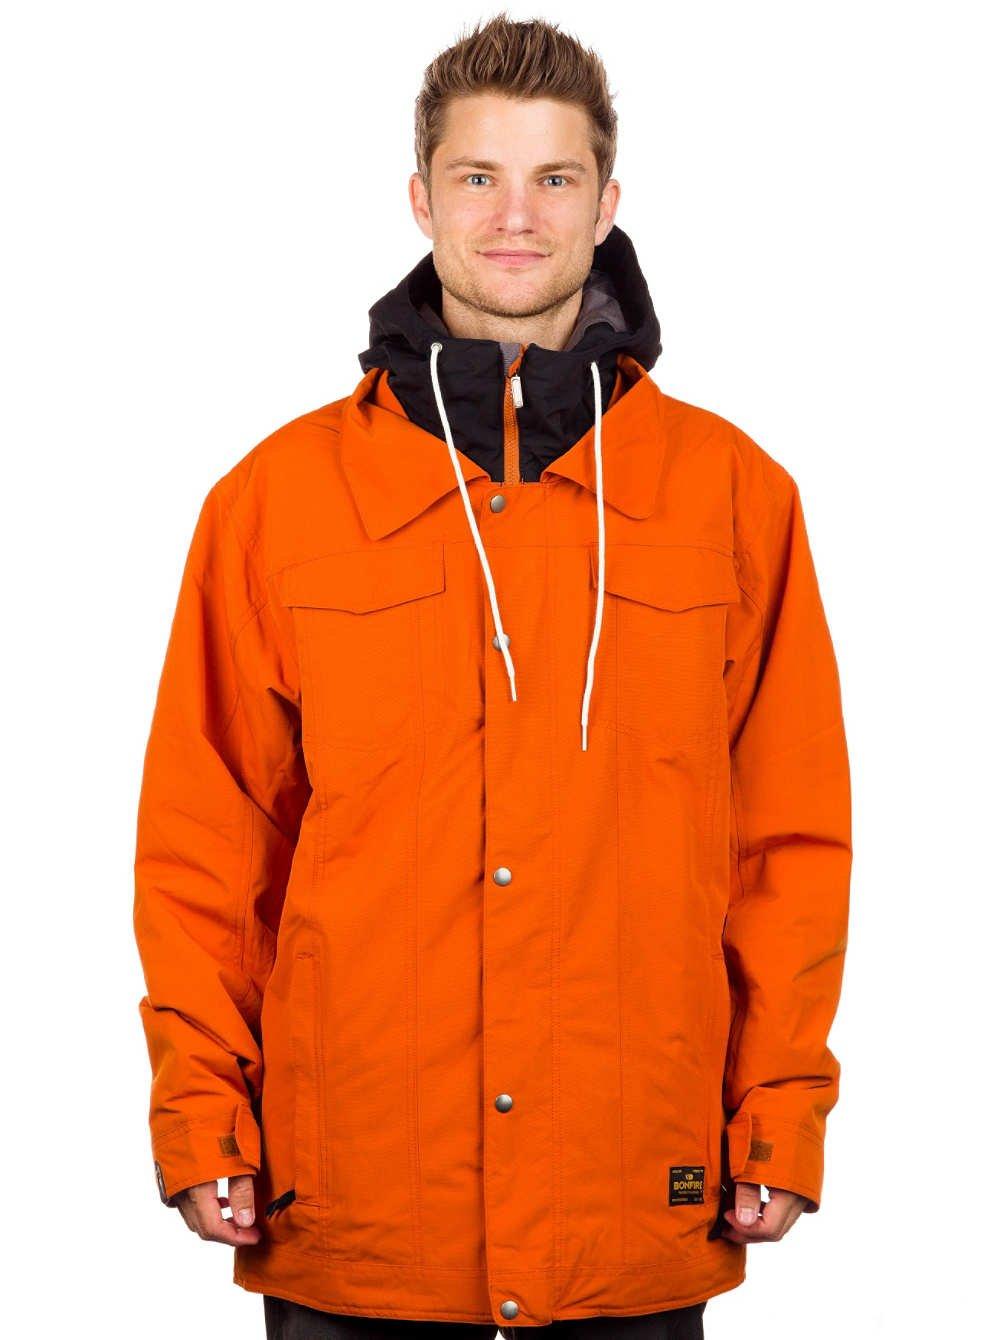 Sienna Blue Bonfire Morris Mens Snowboard Jacket